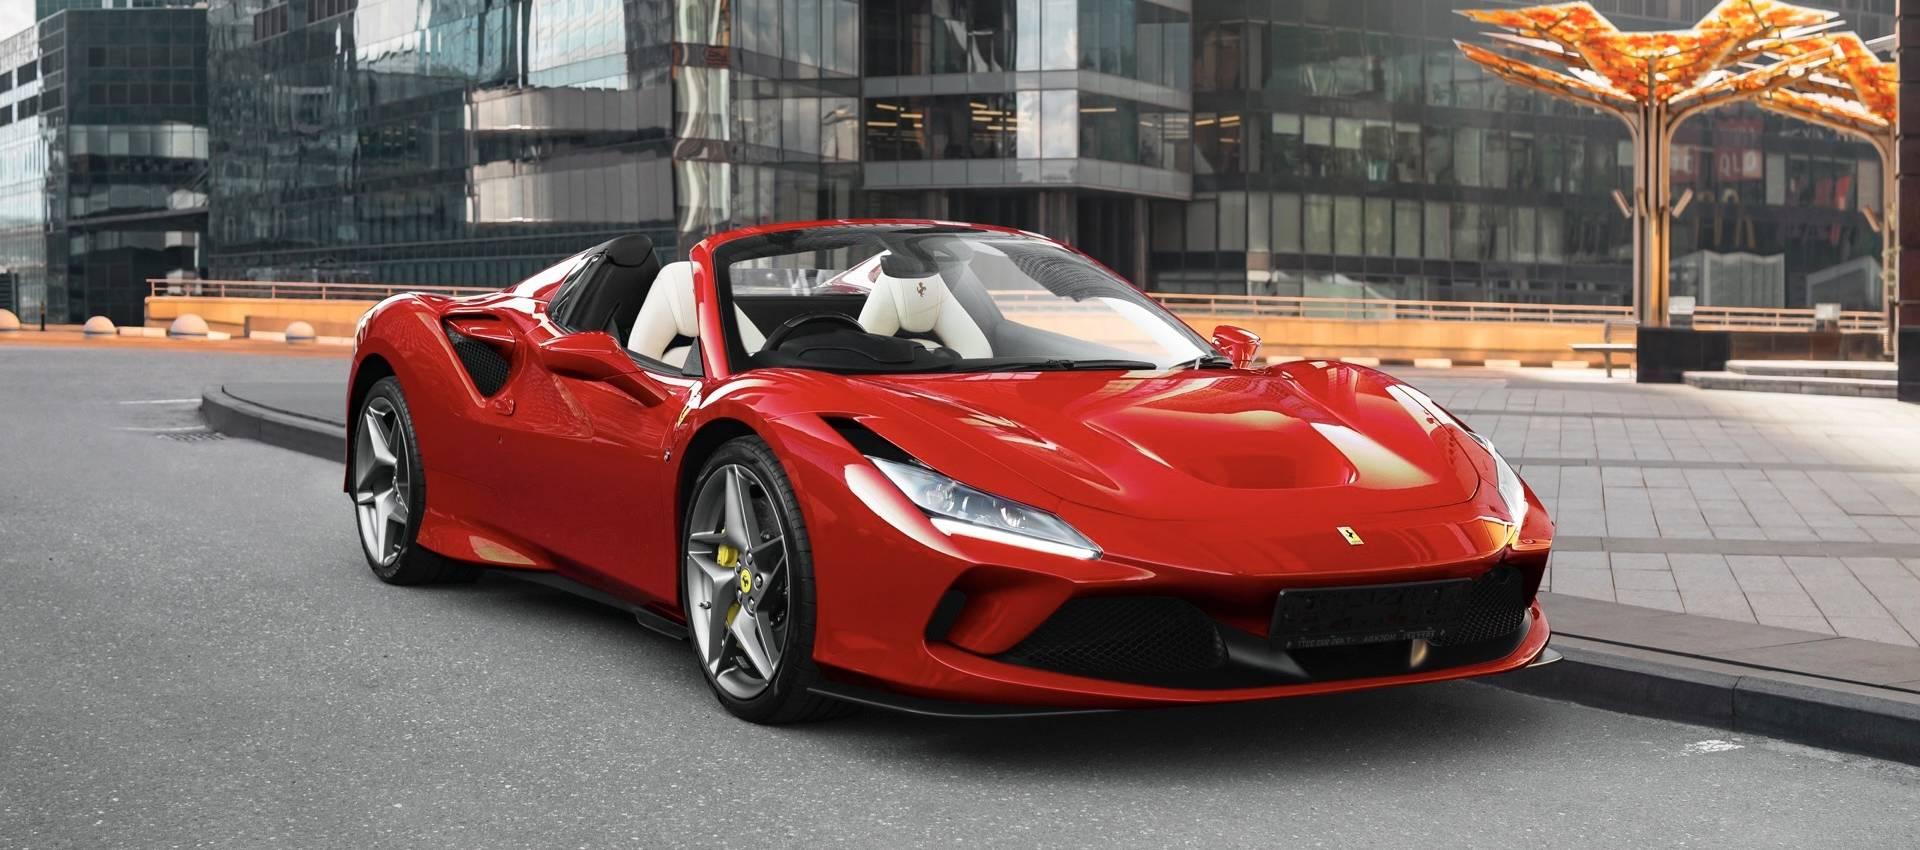 Аренда Ferrari F8 Spider в Москве